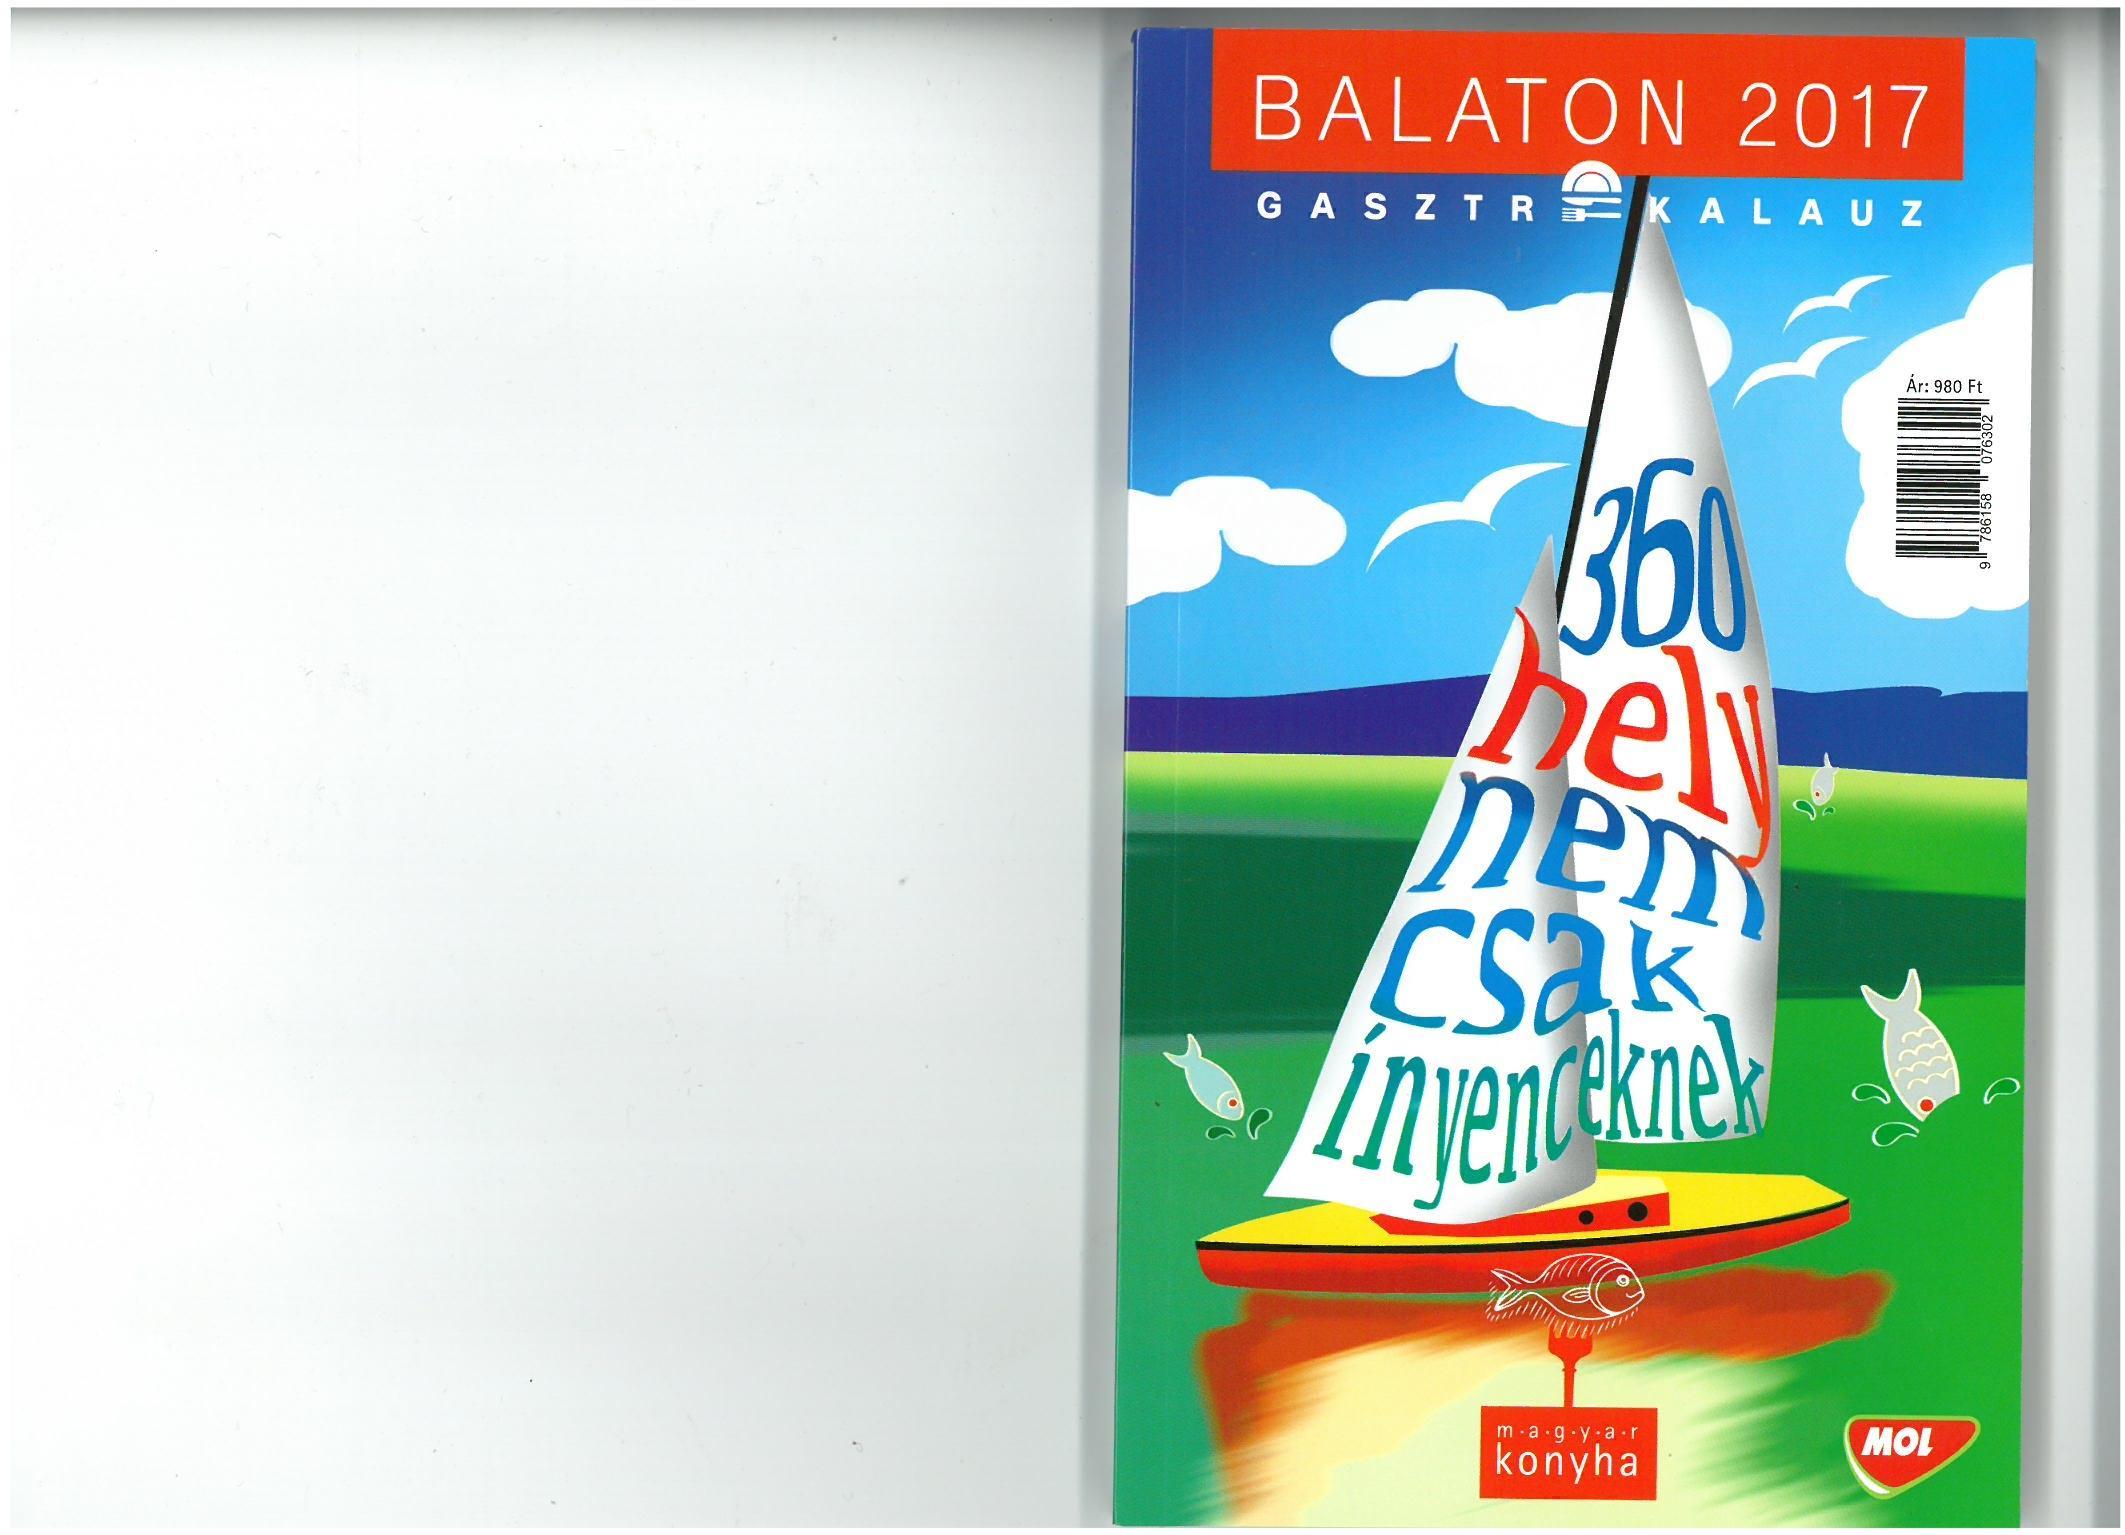 BALATON 2017 GASZTROKALAUZ